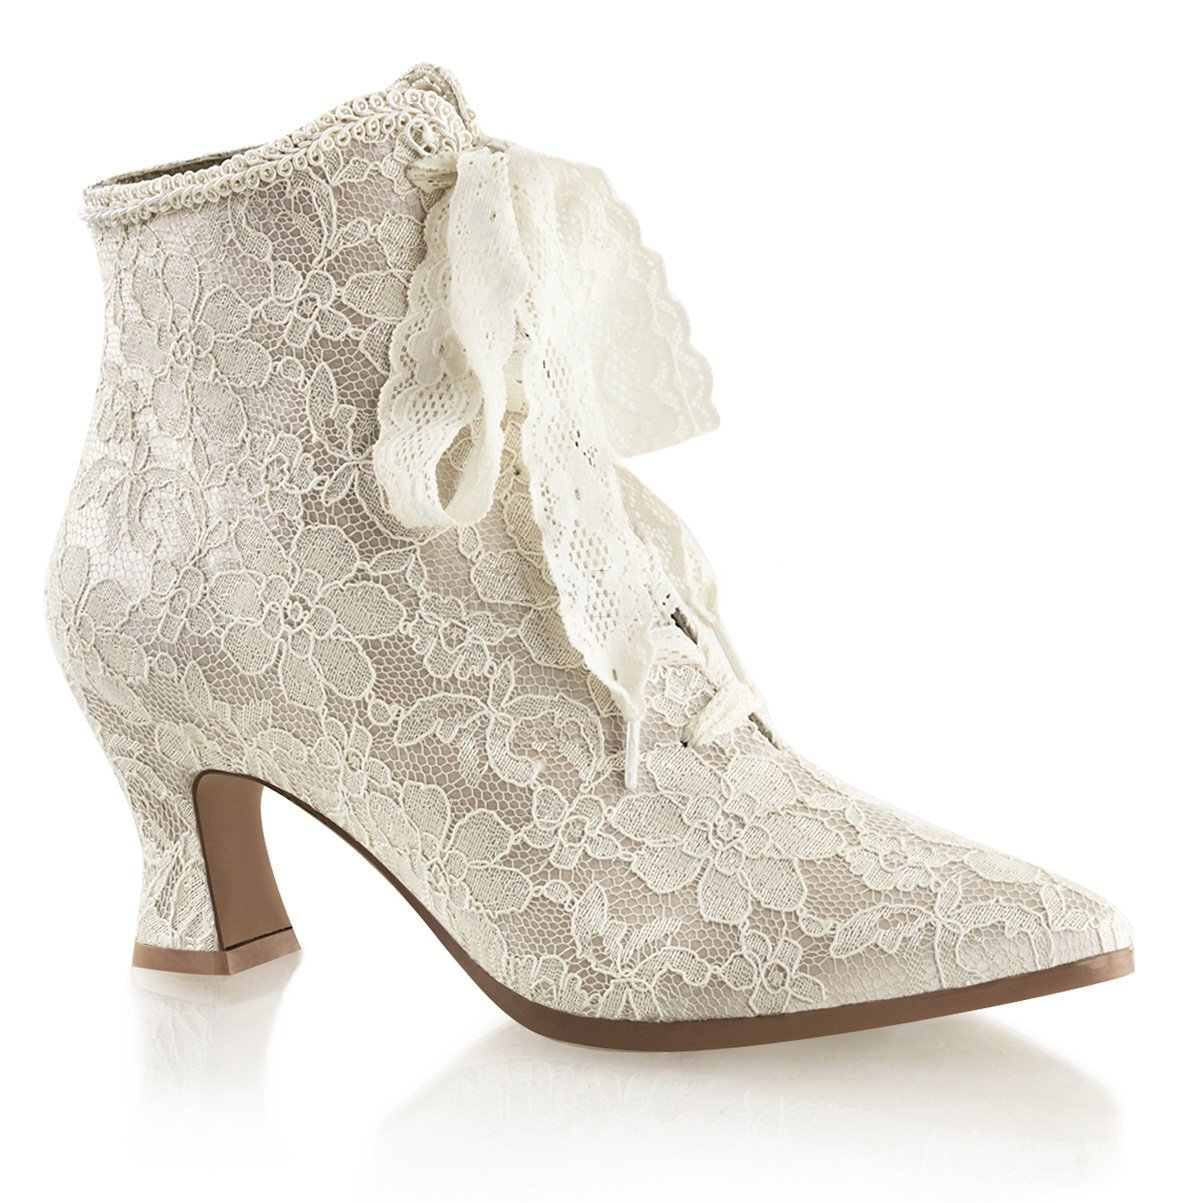 Fabulicious VICTORIAN-30 womens Boots B00NPOPAHQ 12 B(M) US|Champaign Satin-lace